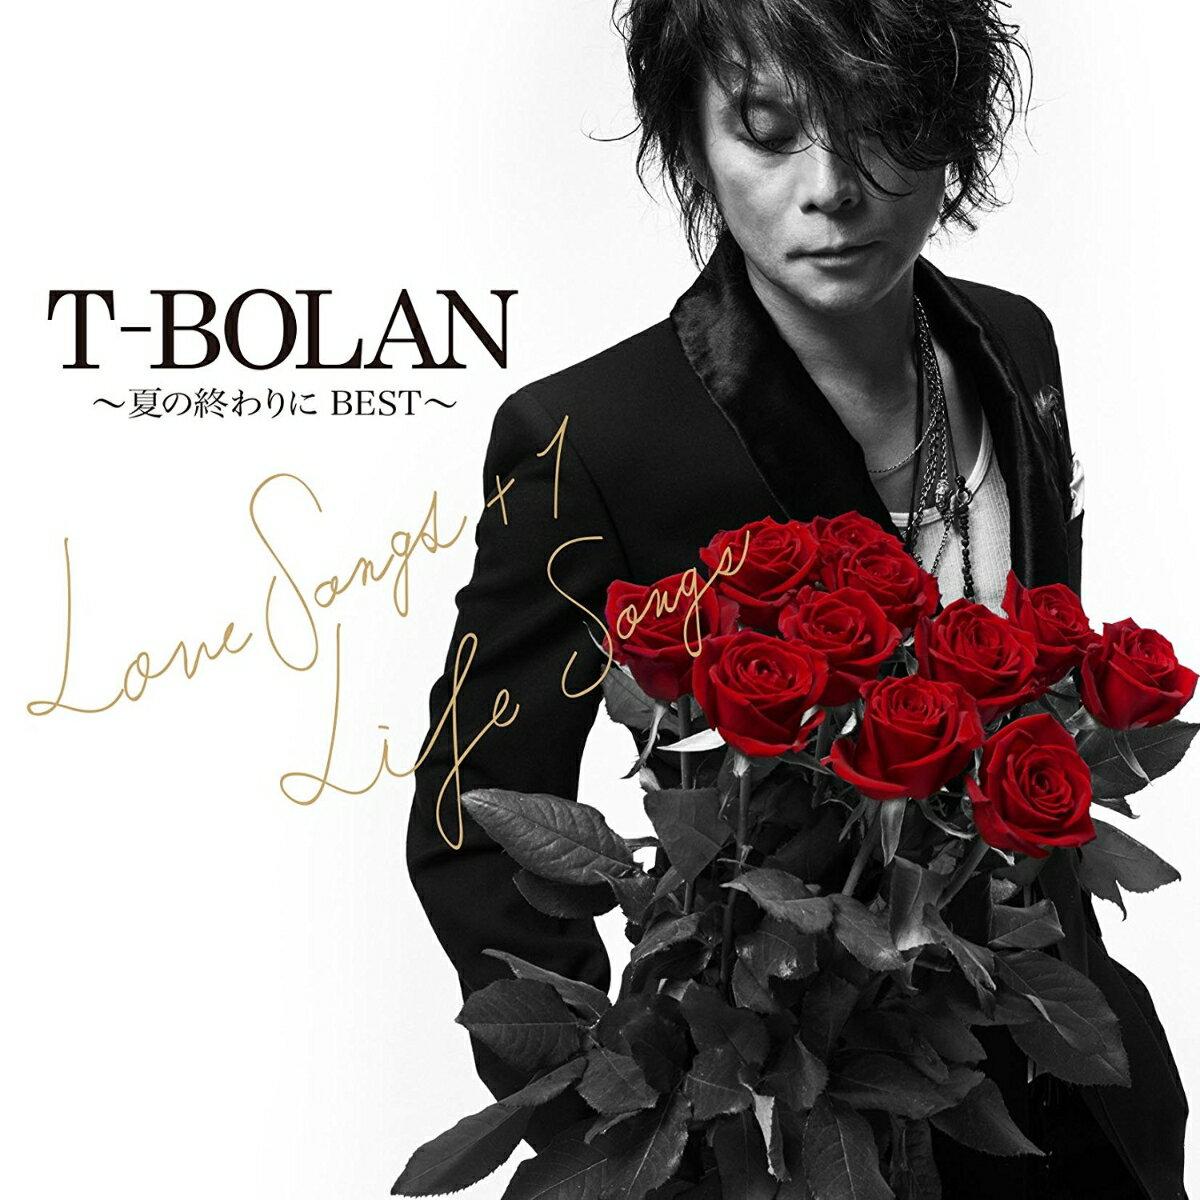 T-BOLAN 〜夏の終わりに BEST〜 LOVE SONGS +1 & LIFE SONGS (2CD+DVD)画像